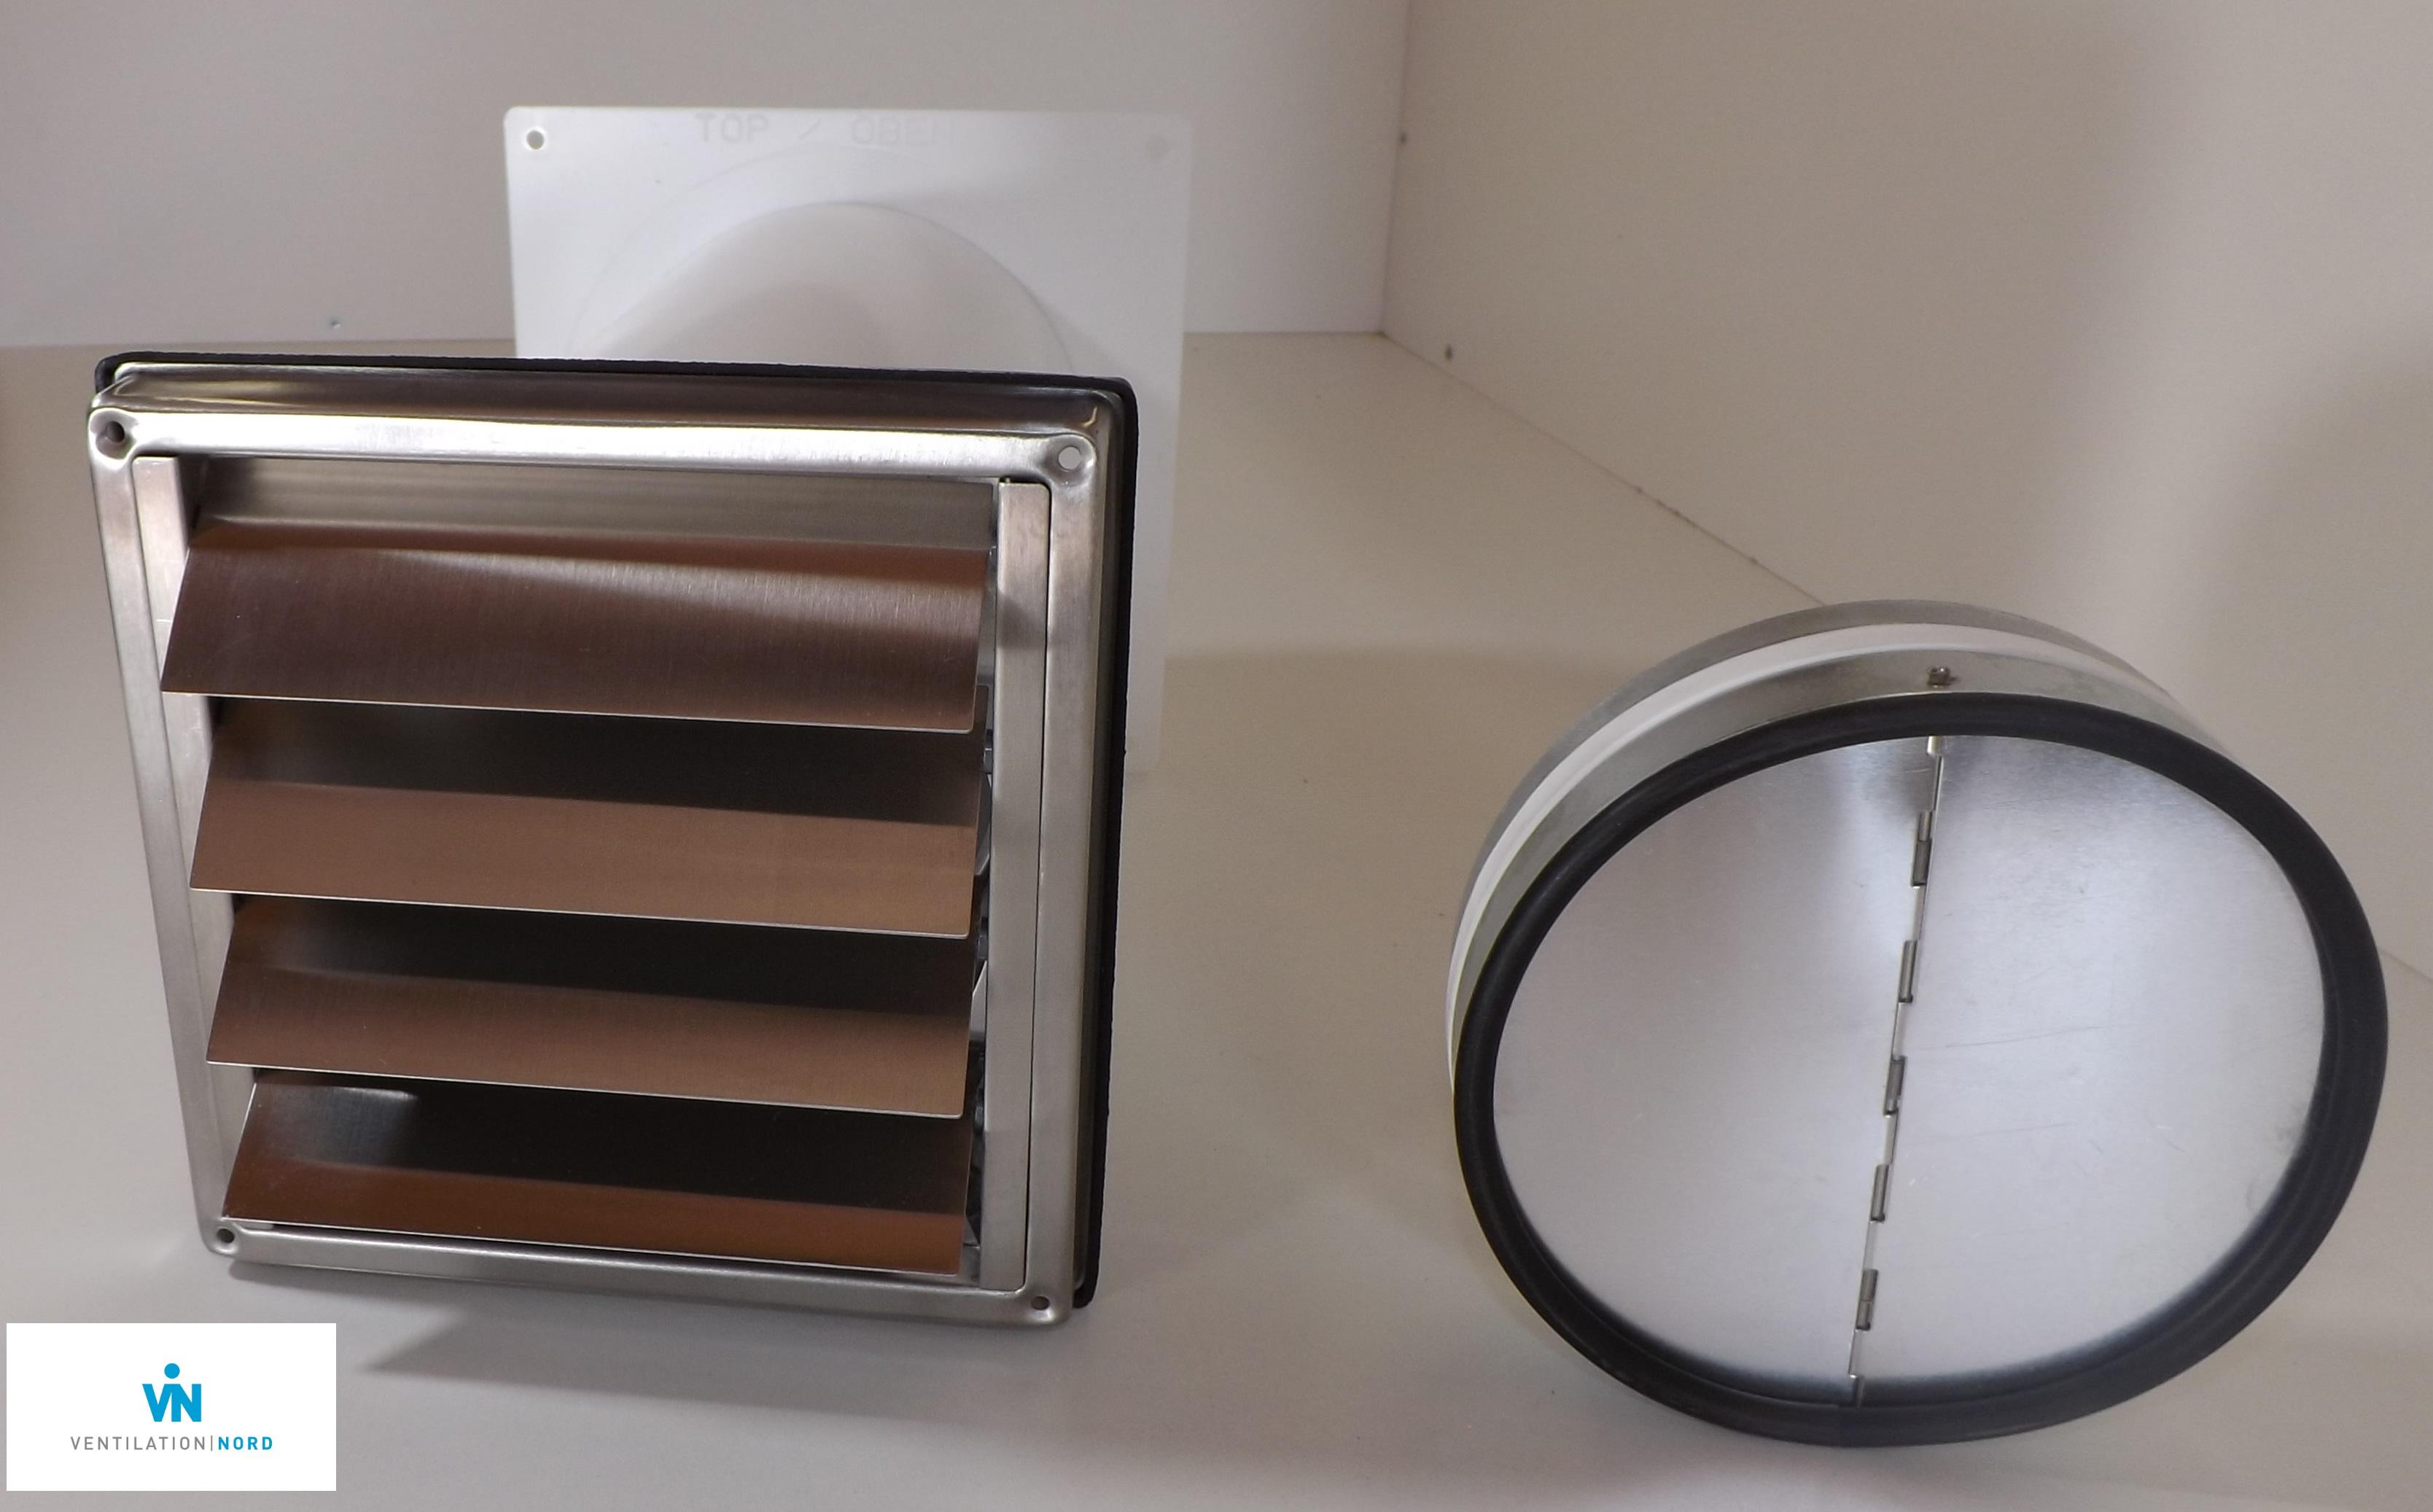 mauerkasten 150 dunstabzug edelstahl r ckstauklappe flachkanal 220x90mm set s6i ebay. Black Bedroom Furniture Sets. Home Design Ideas